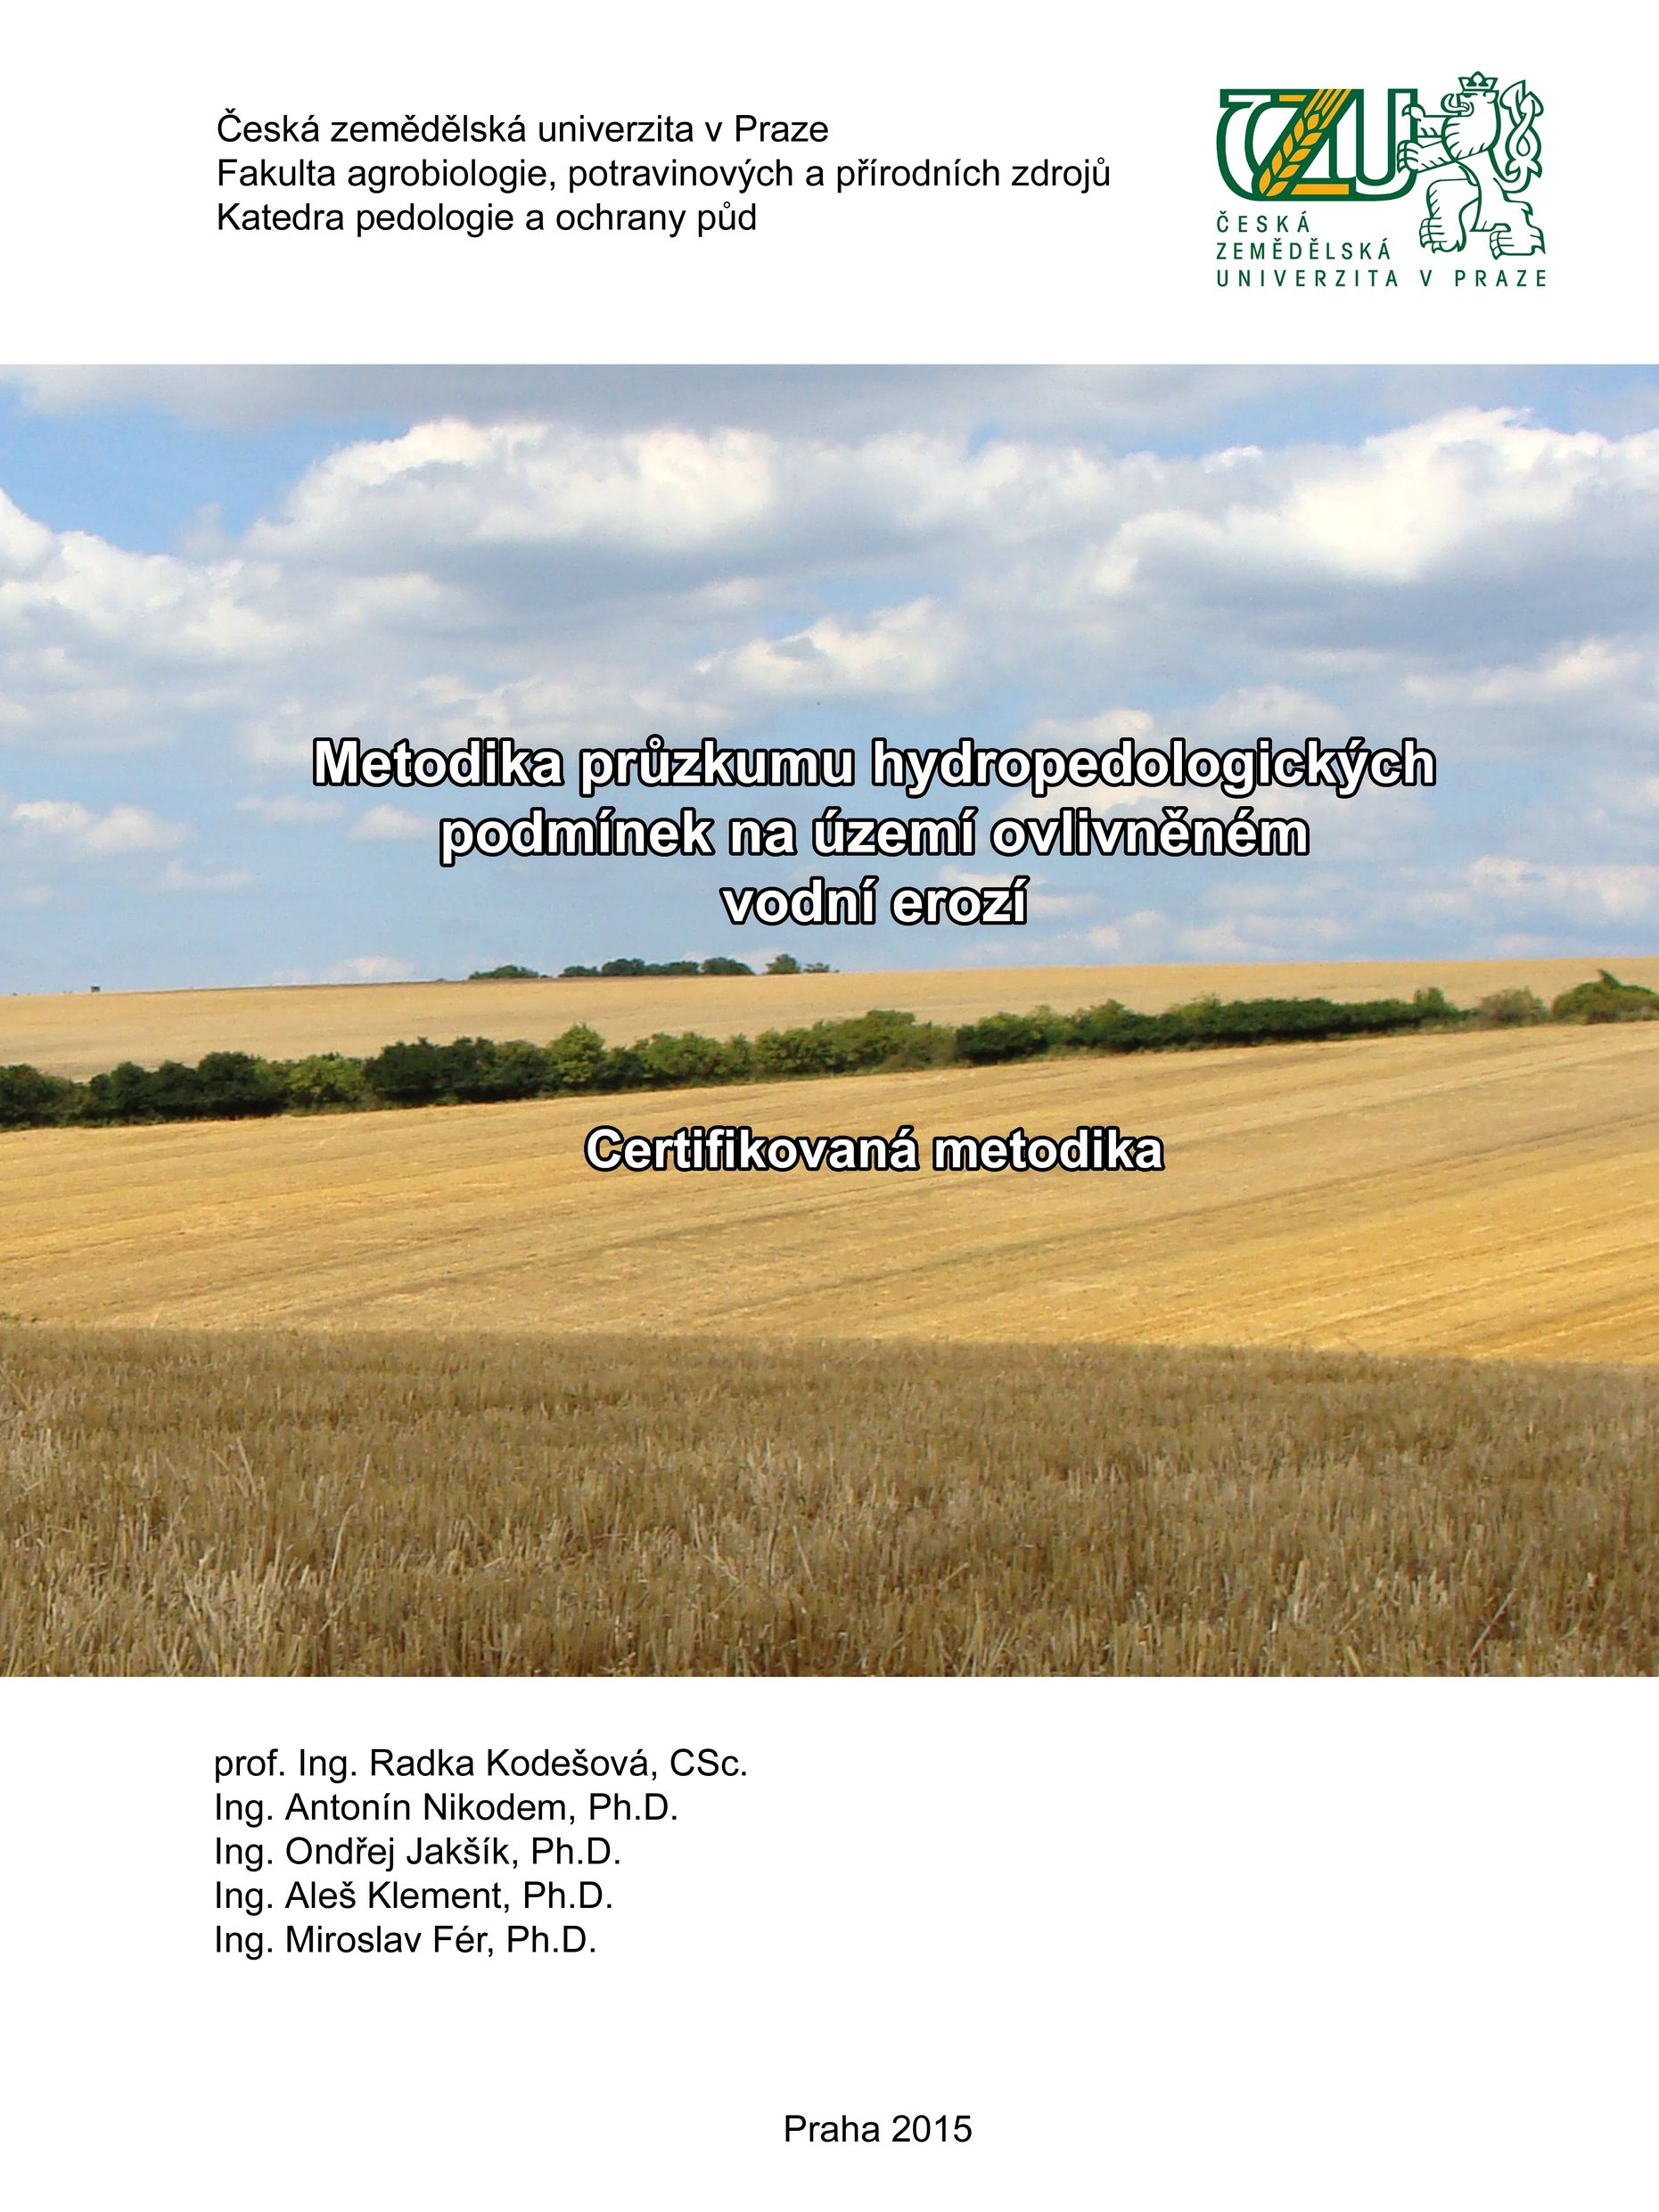 METODIKA-PRUZKUMU-HYDROPEDOLOGICKYCH-PODMINEK-NA-UZEMI-OVLIVNENEM-VODNI-EROZI